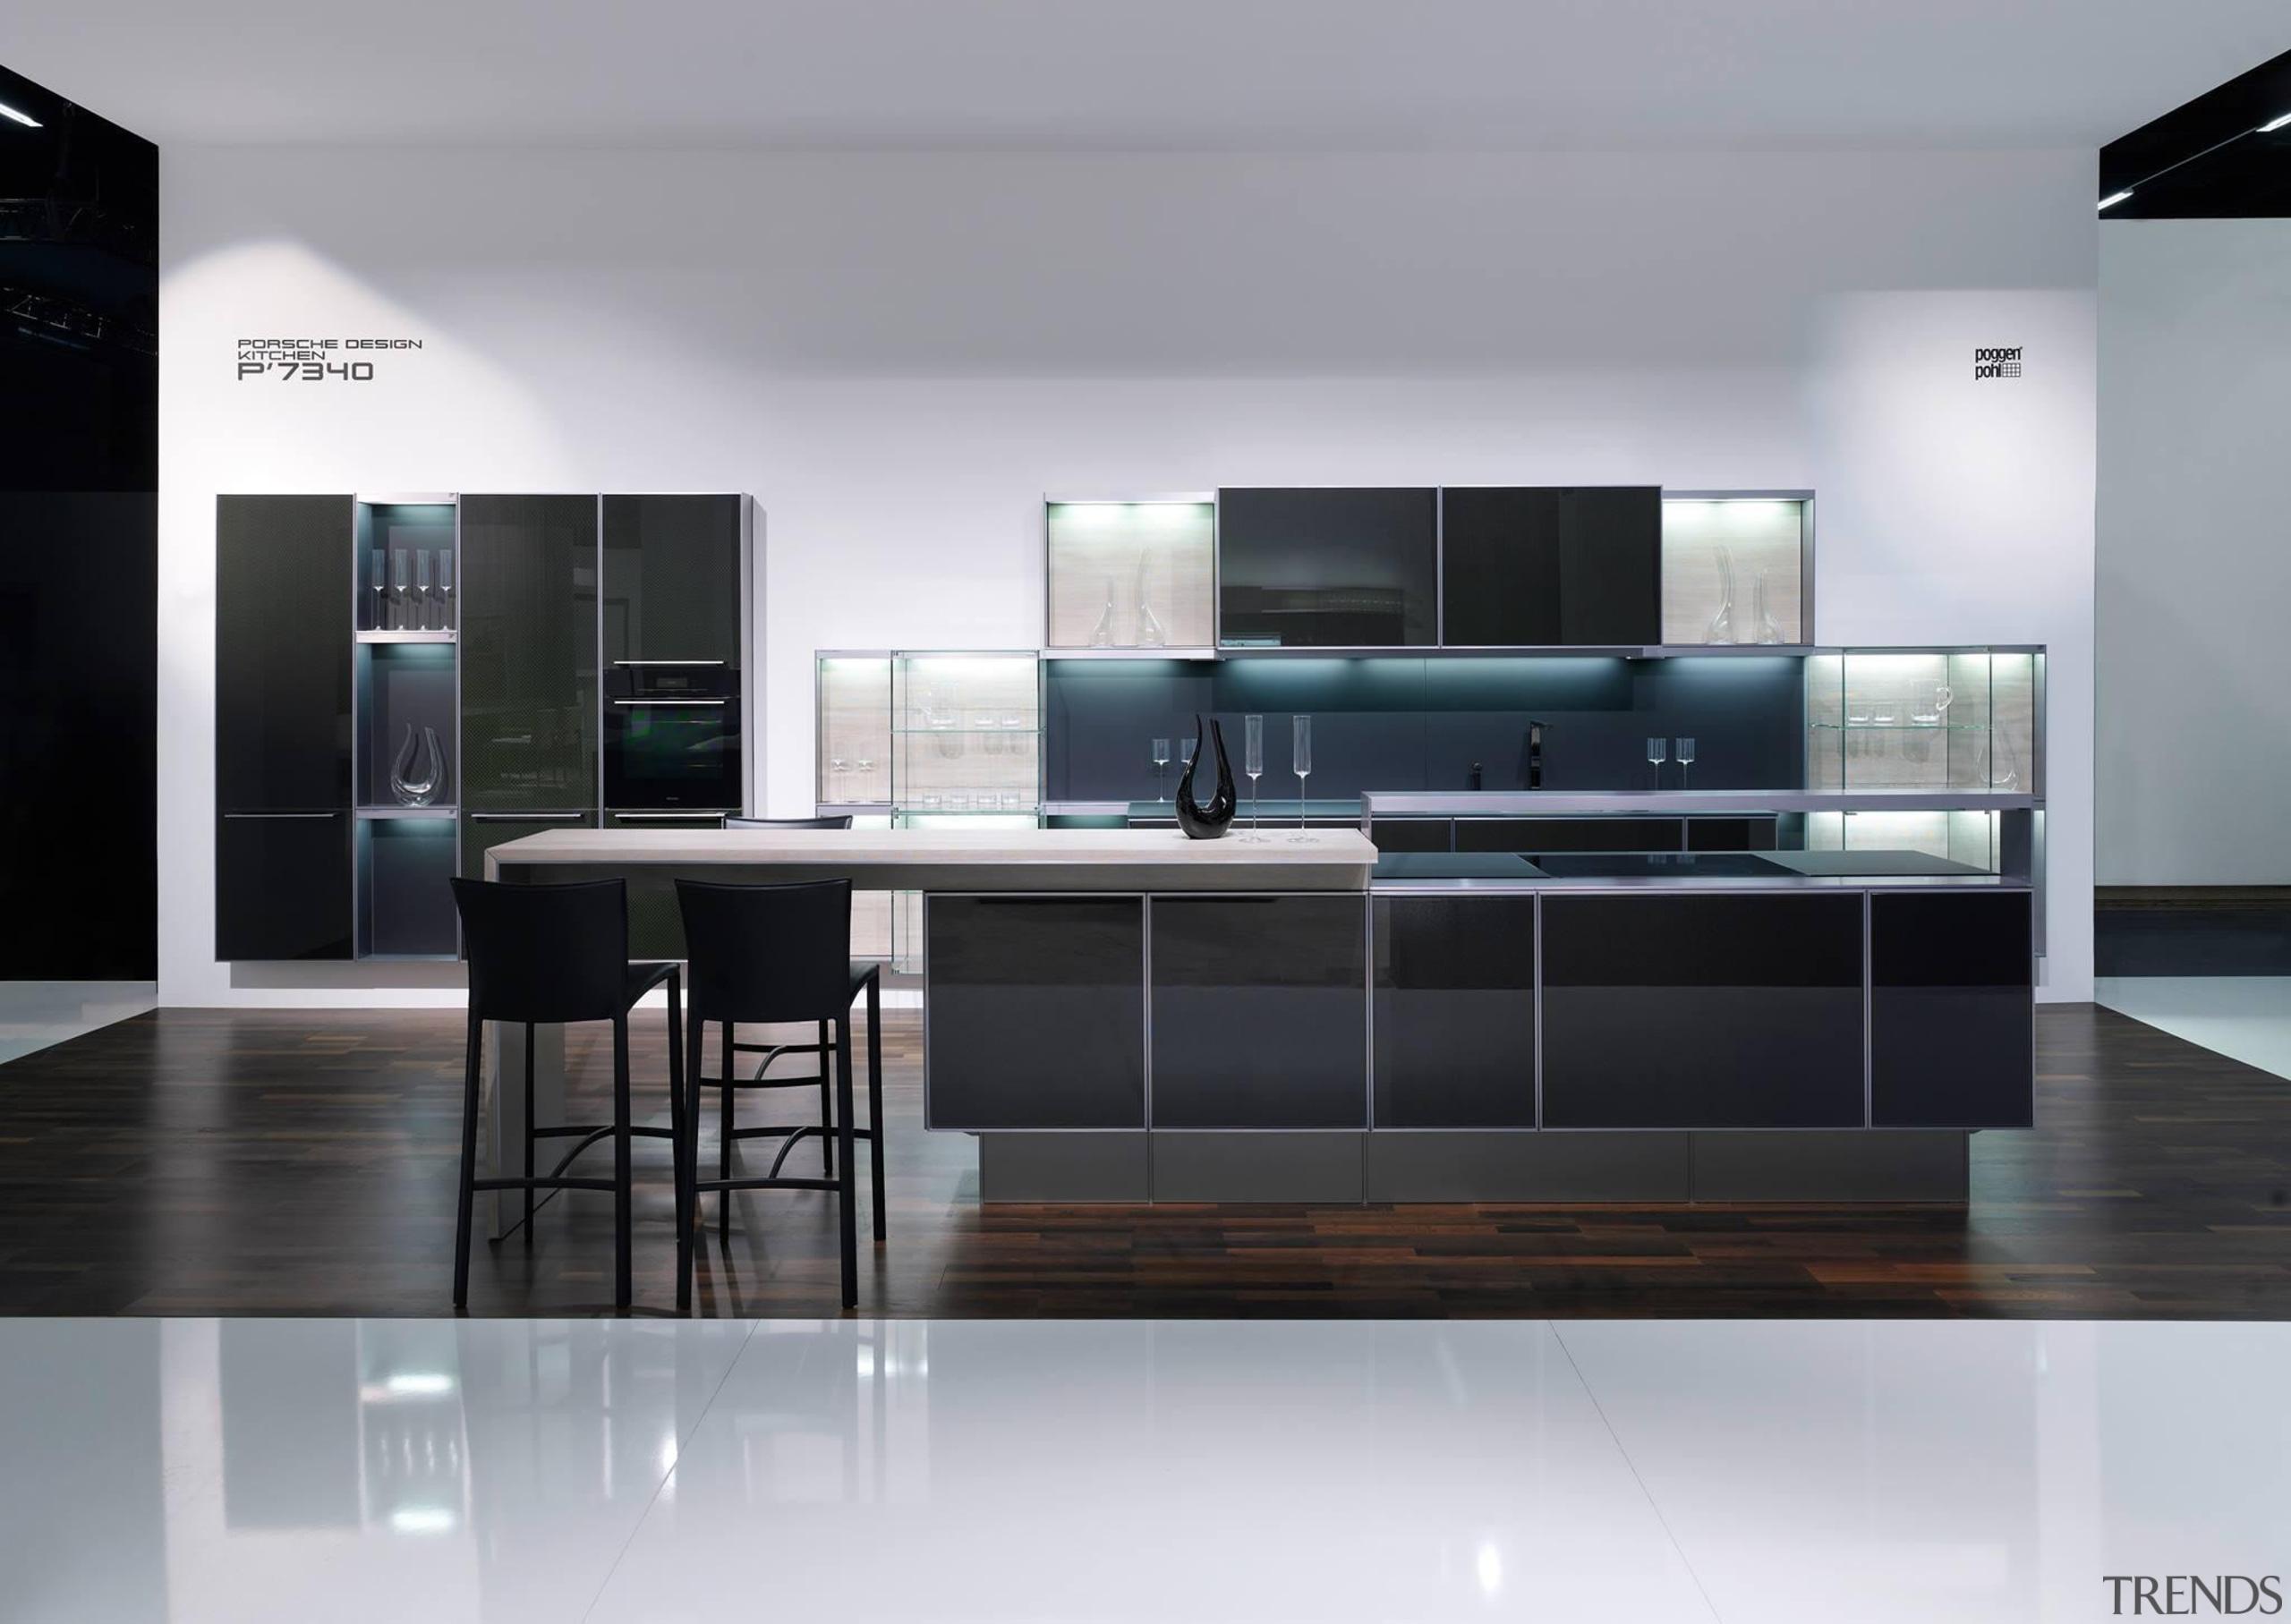 Showroom kitchenFor more information, please visit Poggenpohl countertop, floor, furniture, interior design, kitchen, product design, gray, black